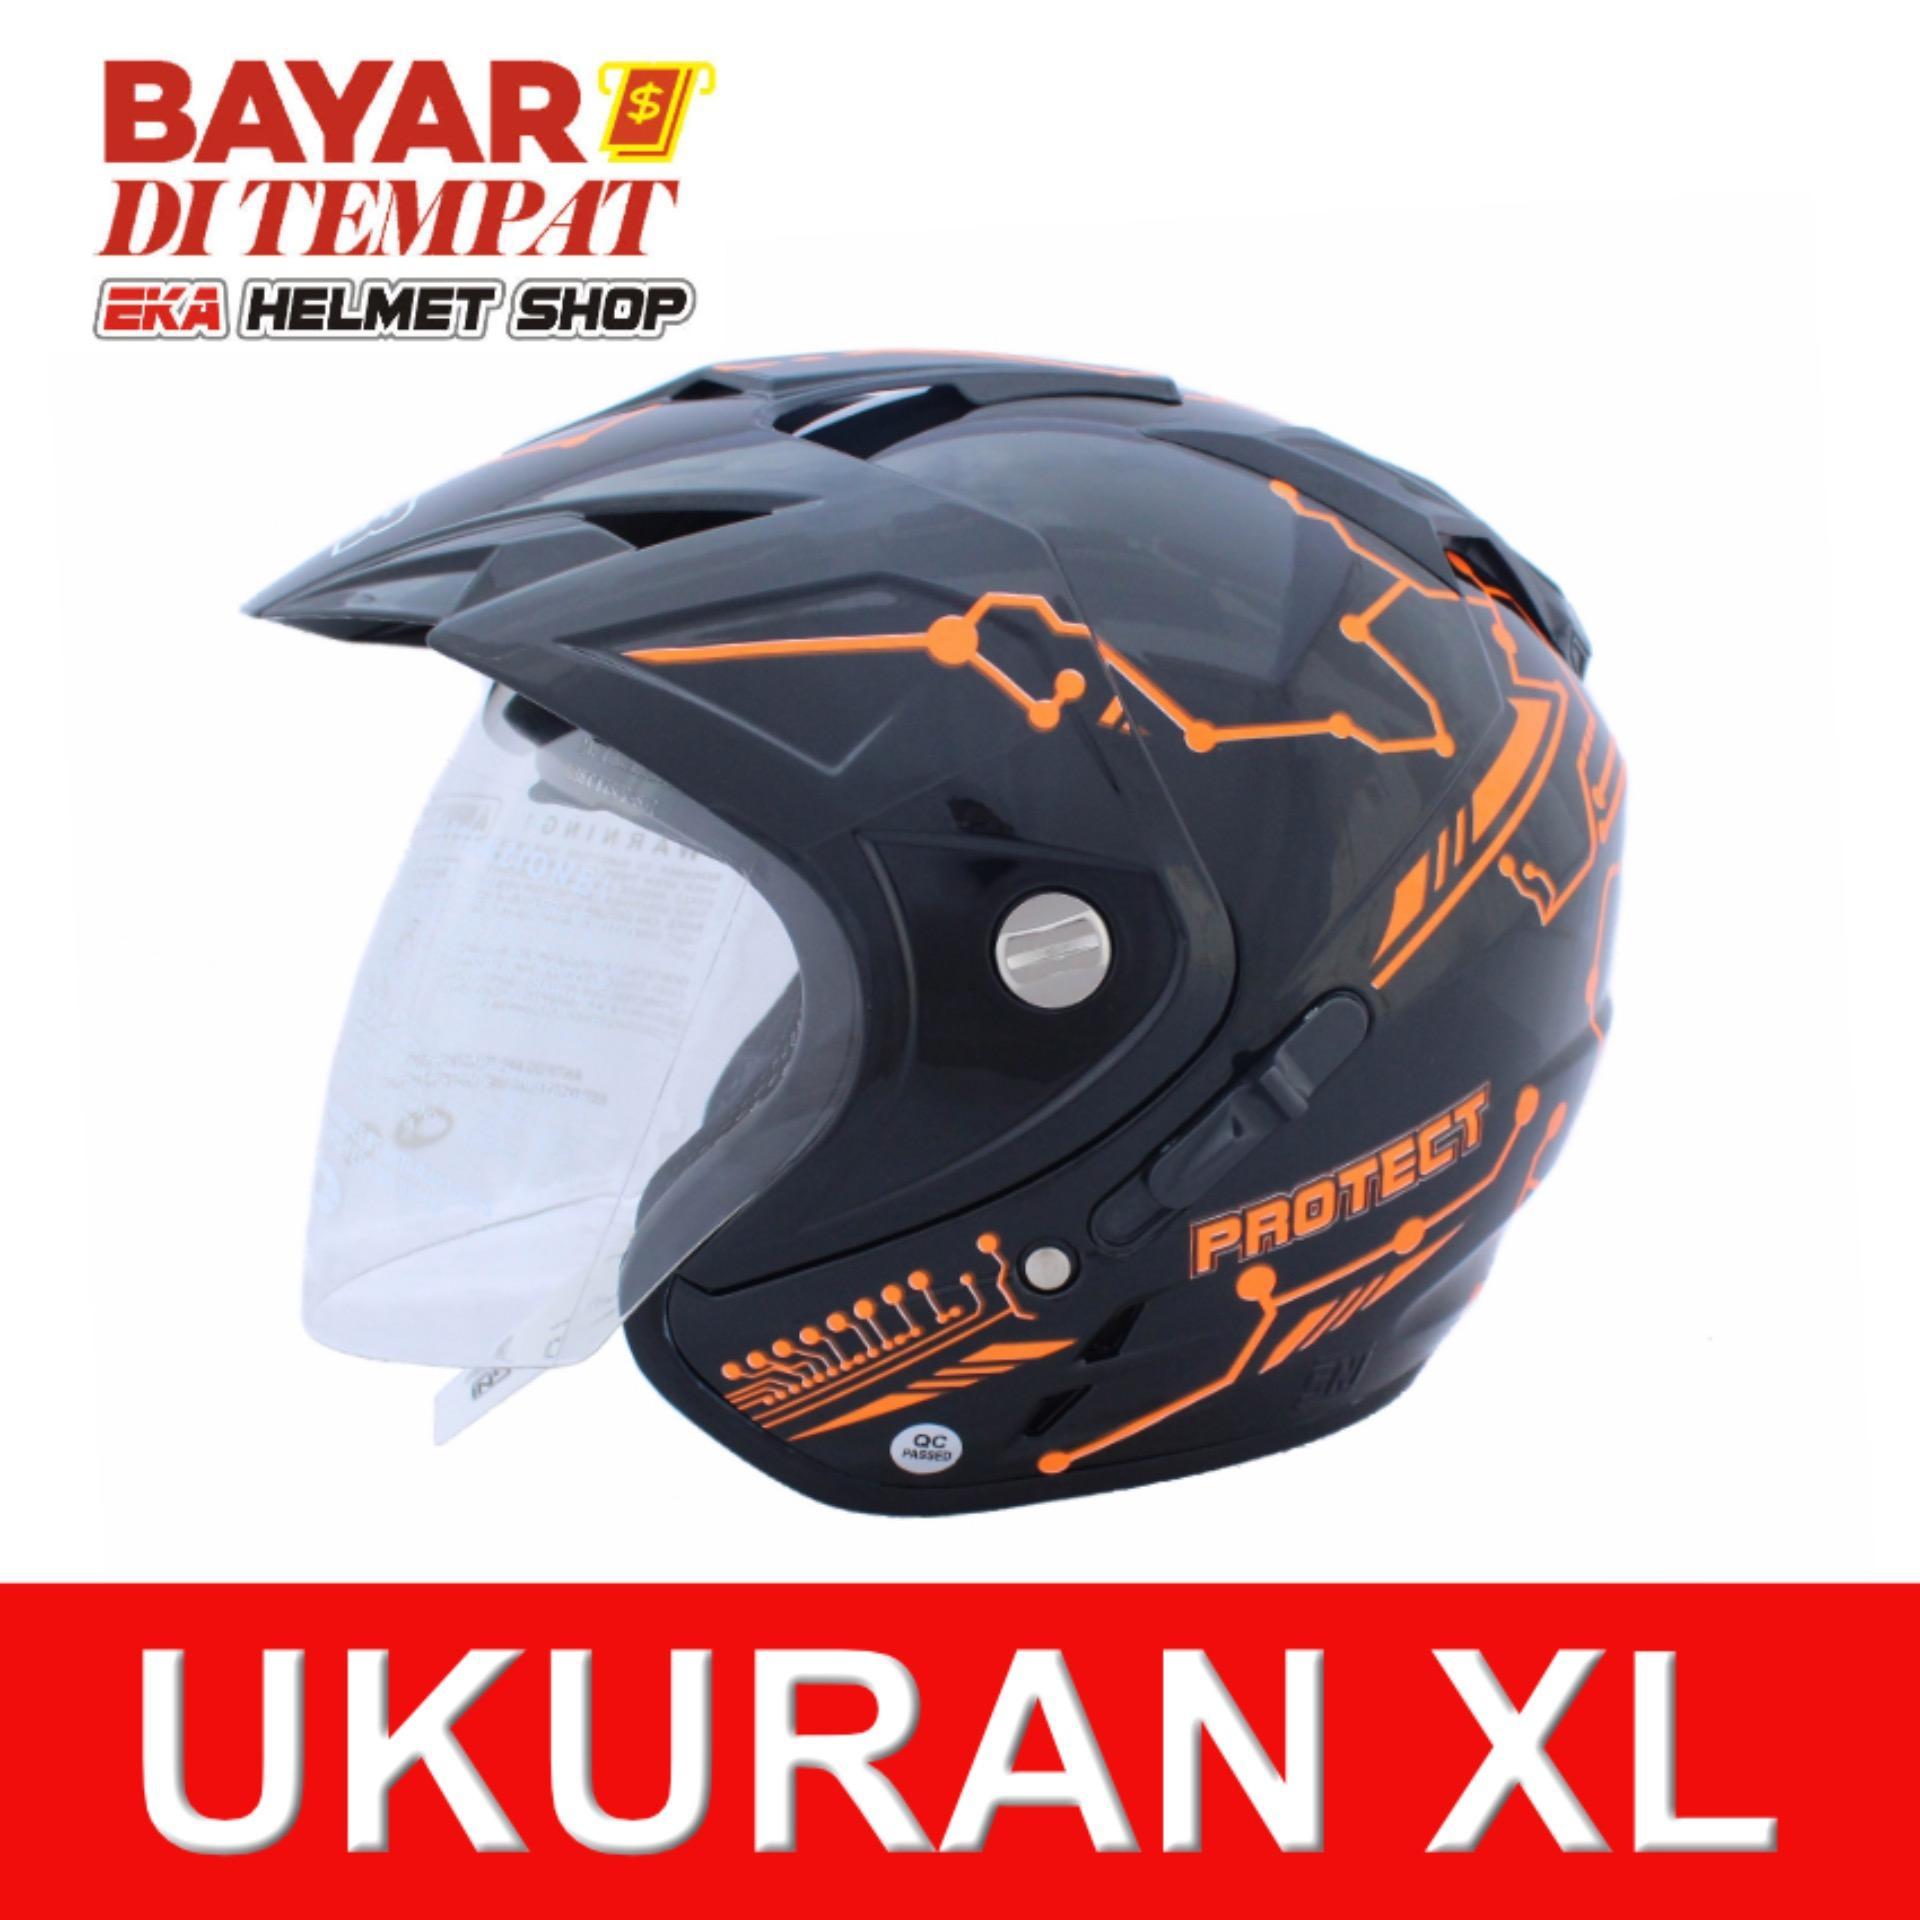 Beli Msr Helmet Impressive Protect Double Visor Hitam Oren Neon Cicil